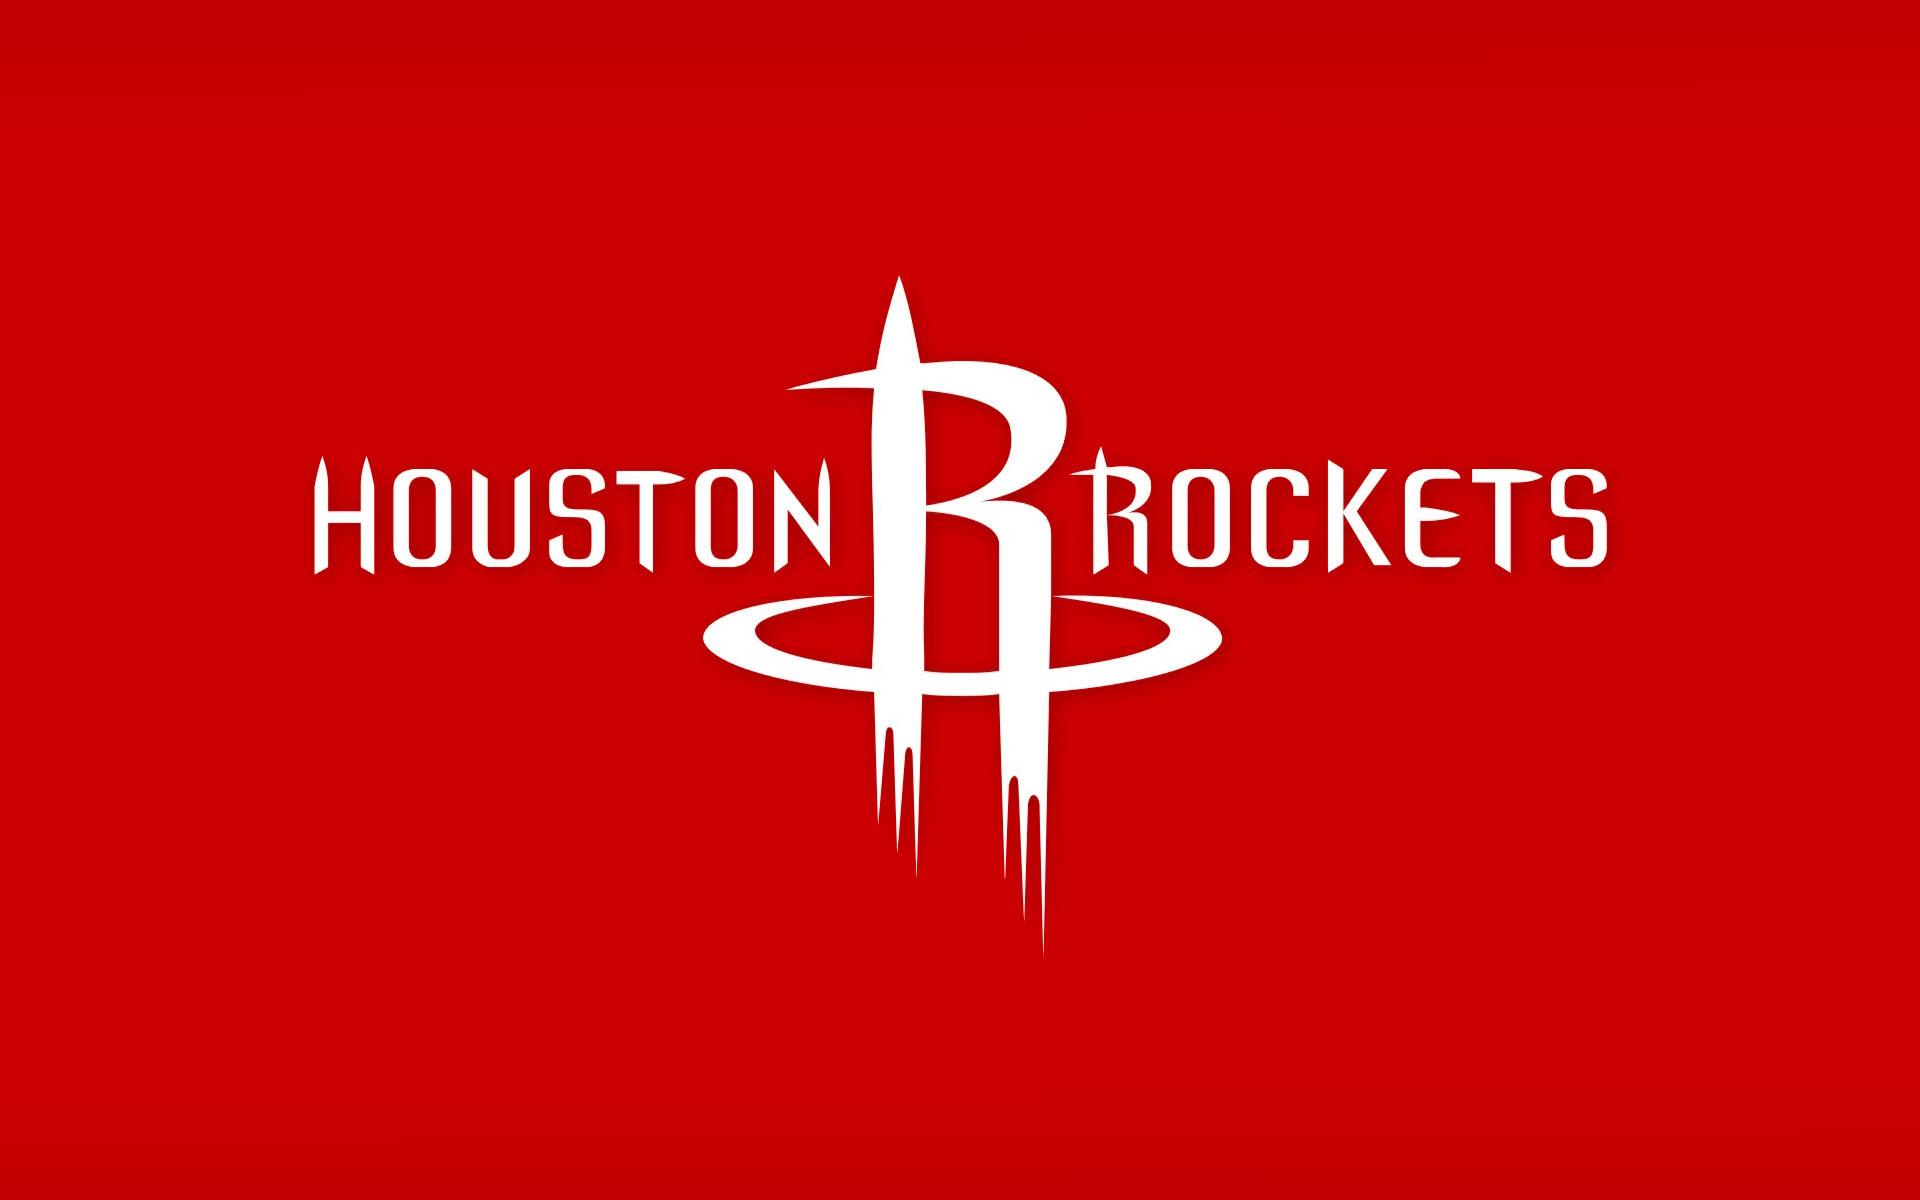 NBA Houston Rockets Logo wallpaper